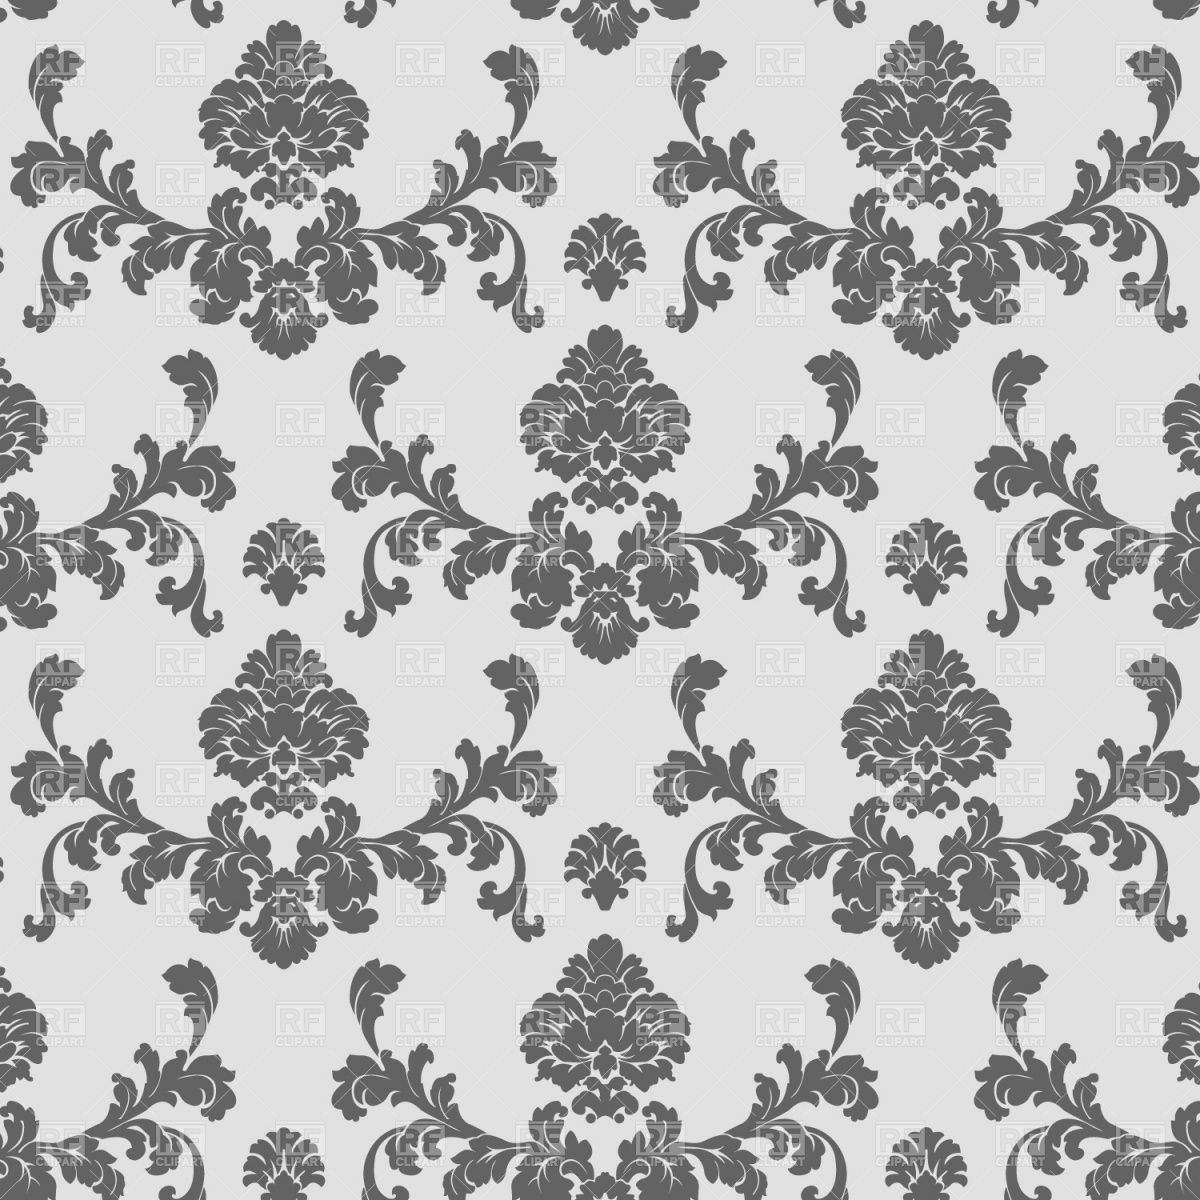 Classic Retro Woodgrain Texture 04 Hd Pictures Antique Paper Free Texture Backgrounds Vintage Wedding Save The Dates